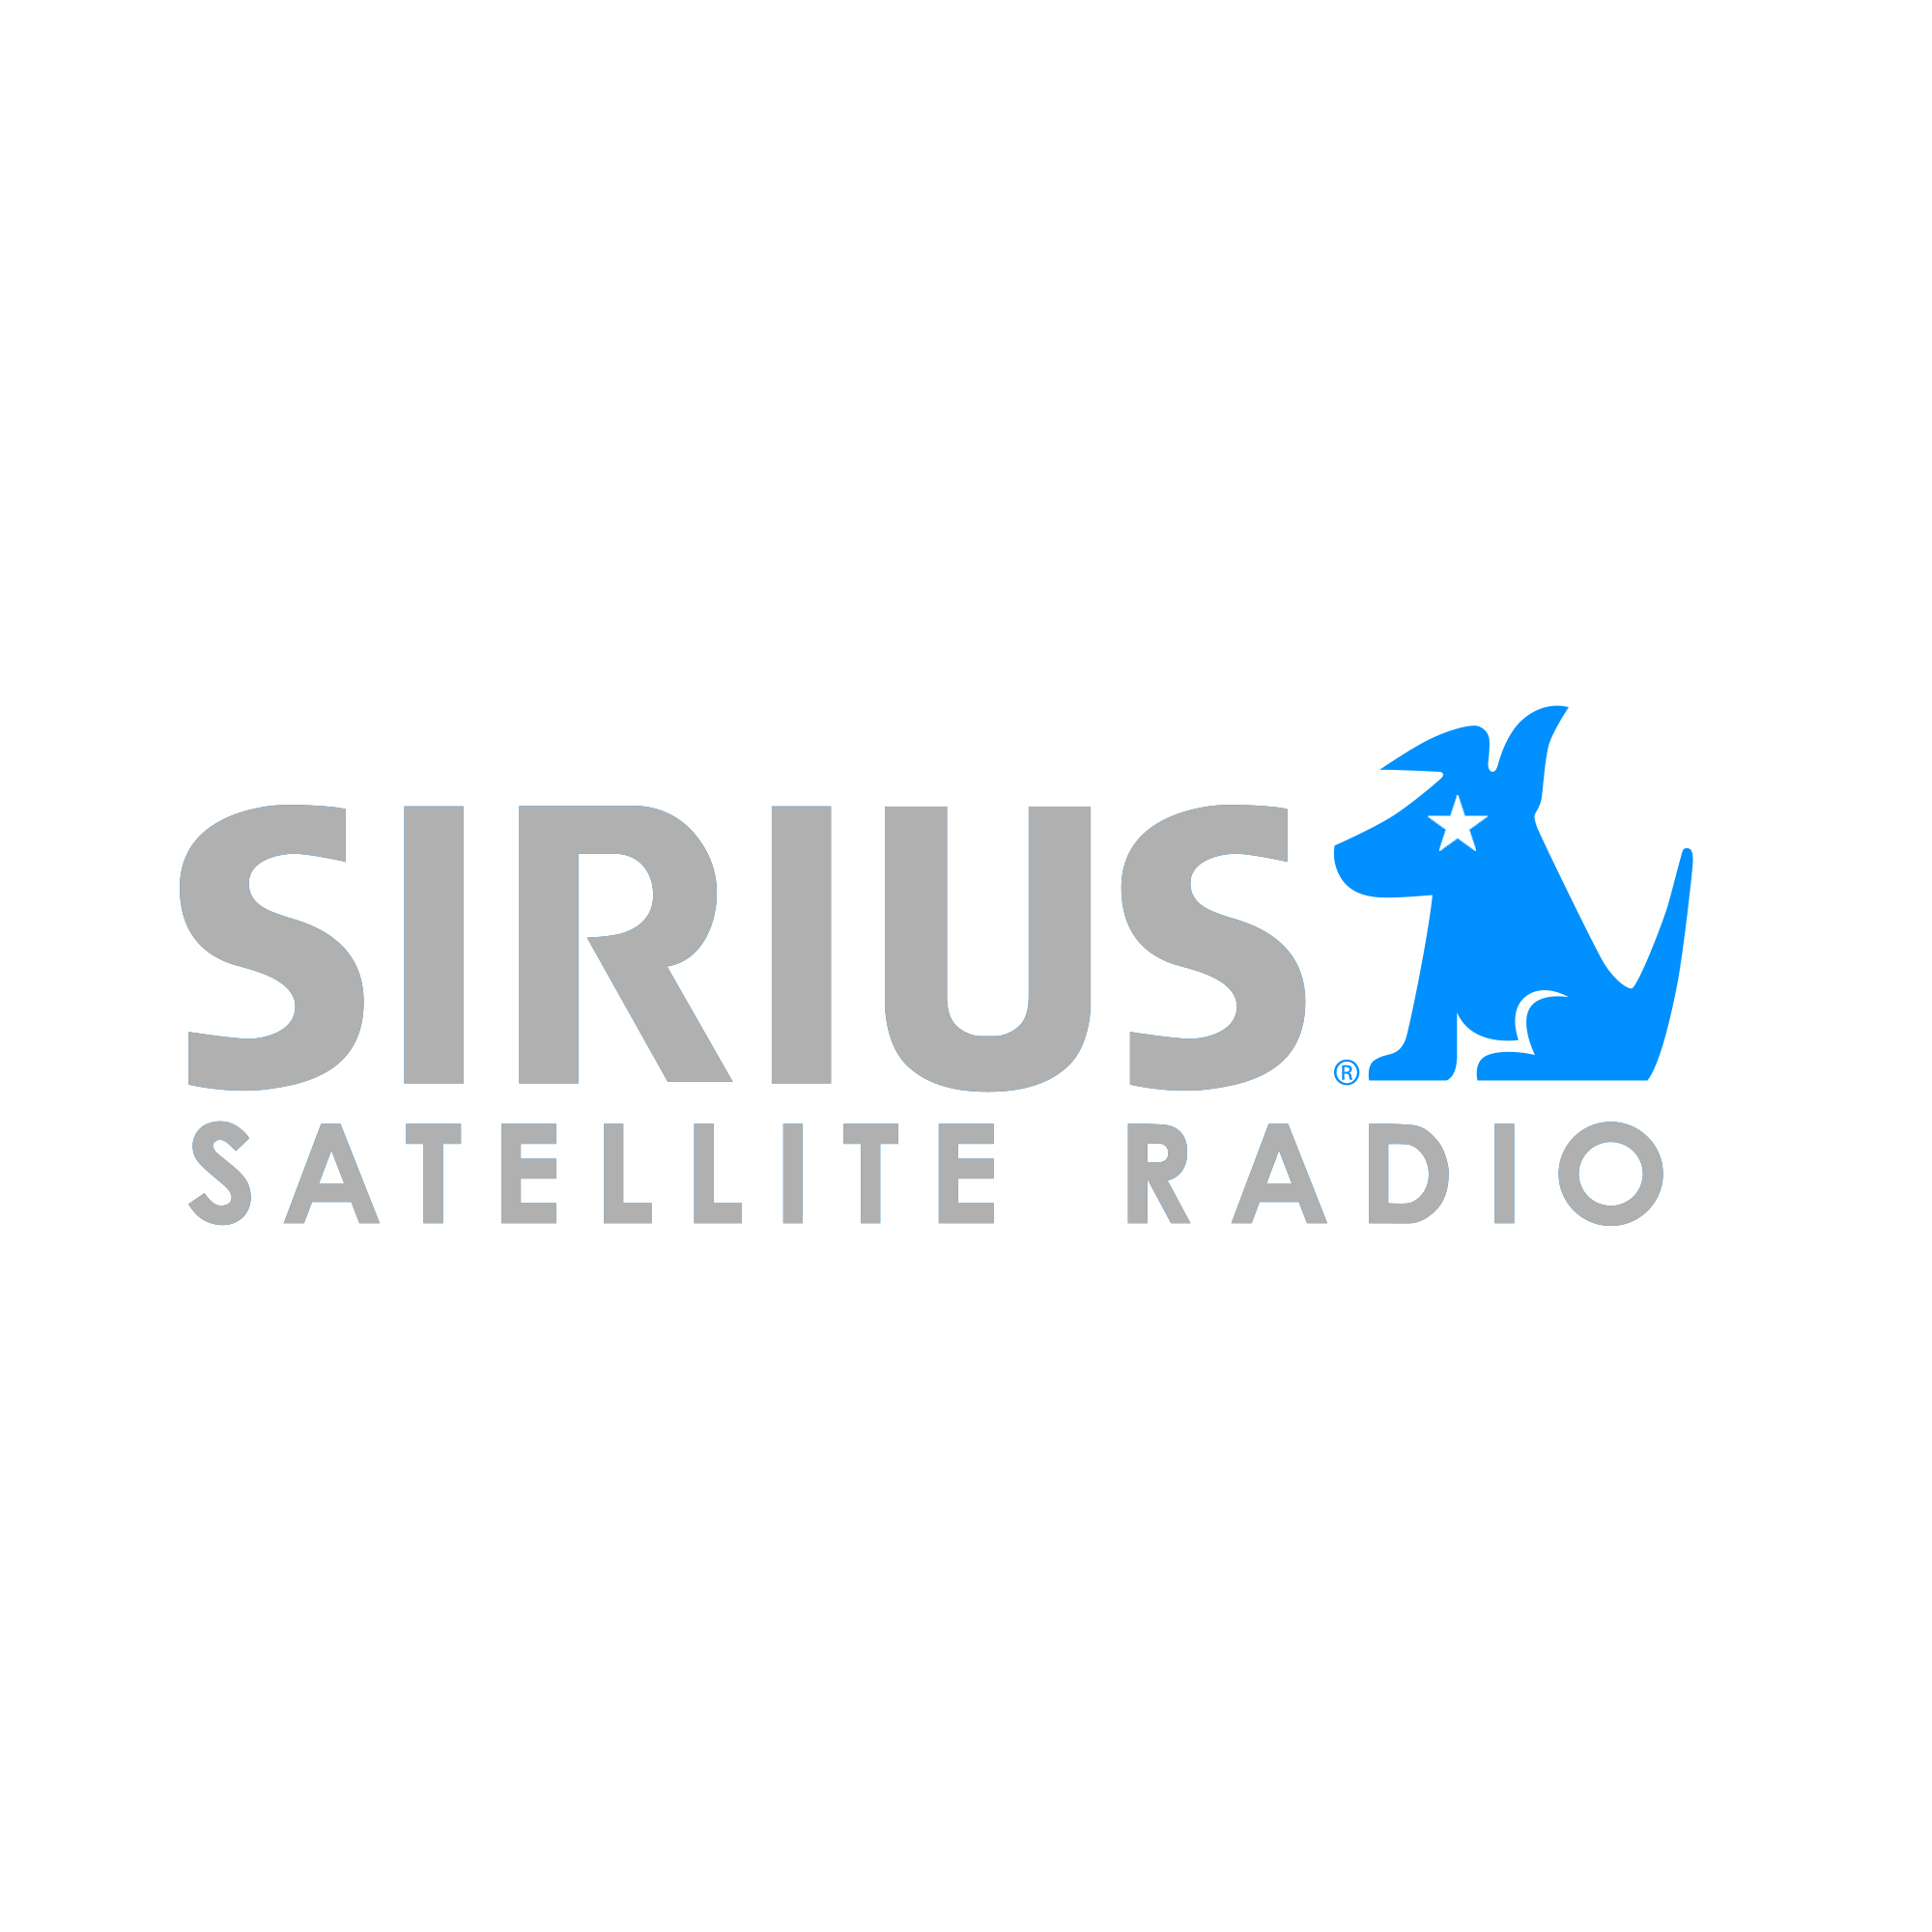 SiriusLogo.jpg